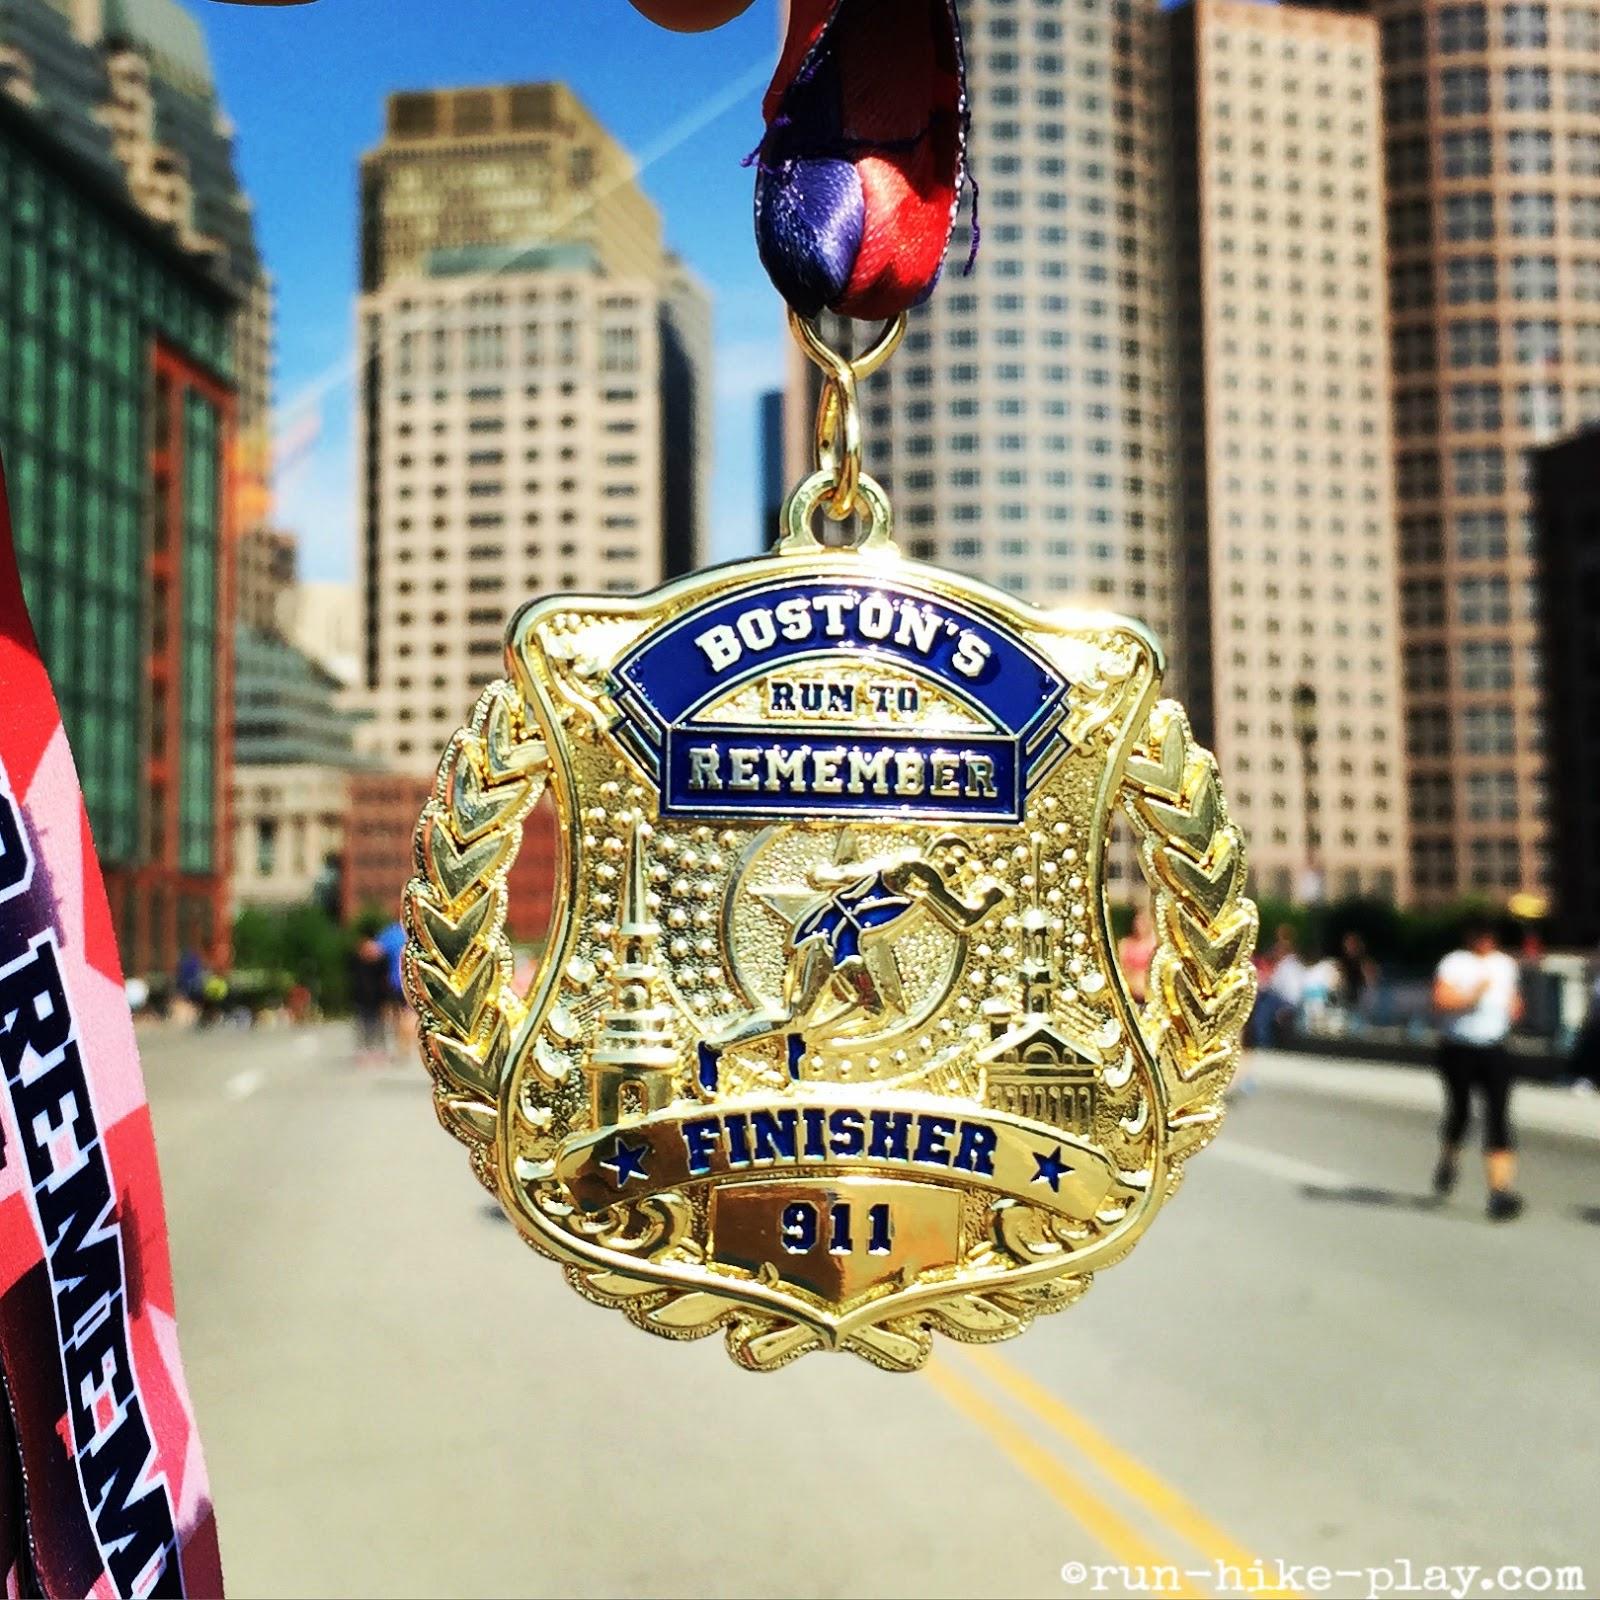 Run-Hike-Play: Boston's Run To Remember Half Marathon Race ...